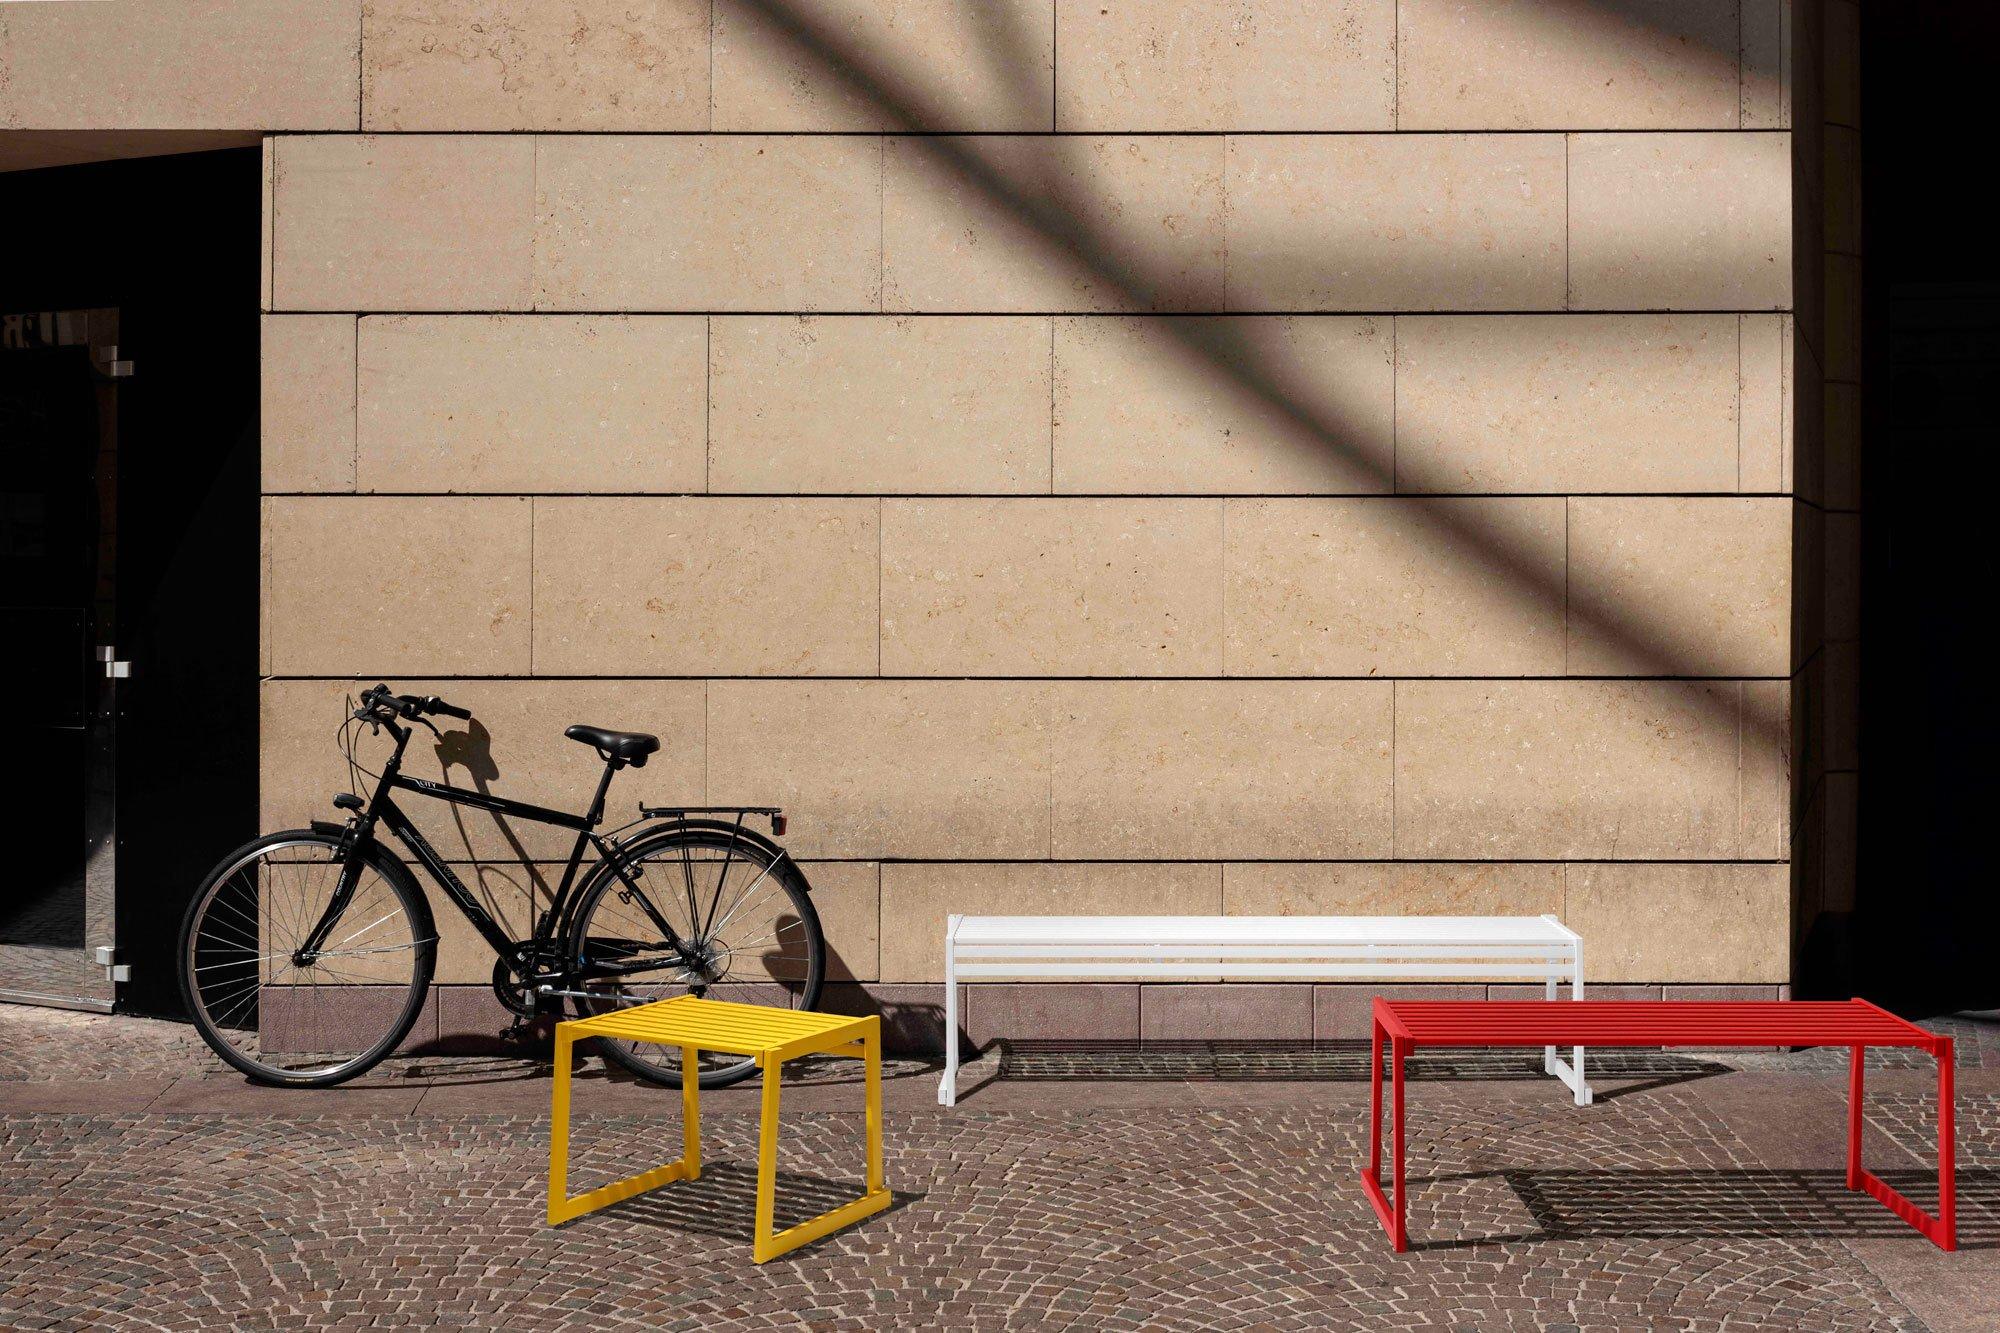 Outdoor-Möbel & Outdoor-KüchenBasaglia + Rota Nodari Studio, Sitzbänke Cortina.026, Diemmebi. Foto/ Copyright: Diemmebi